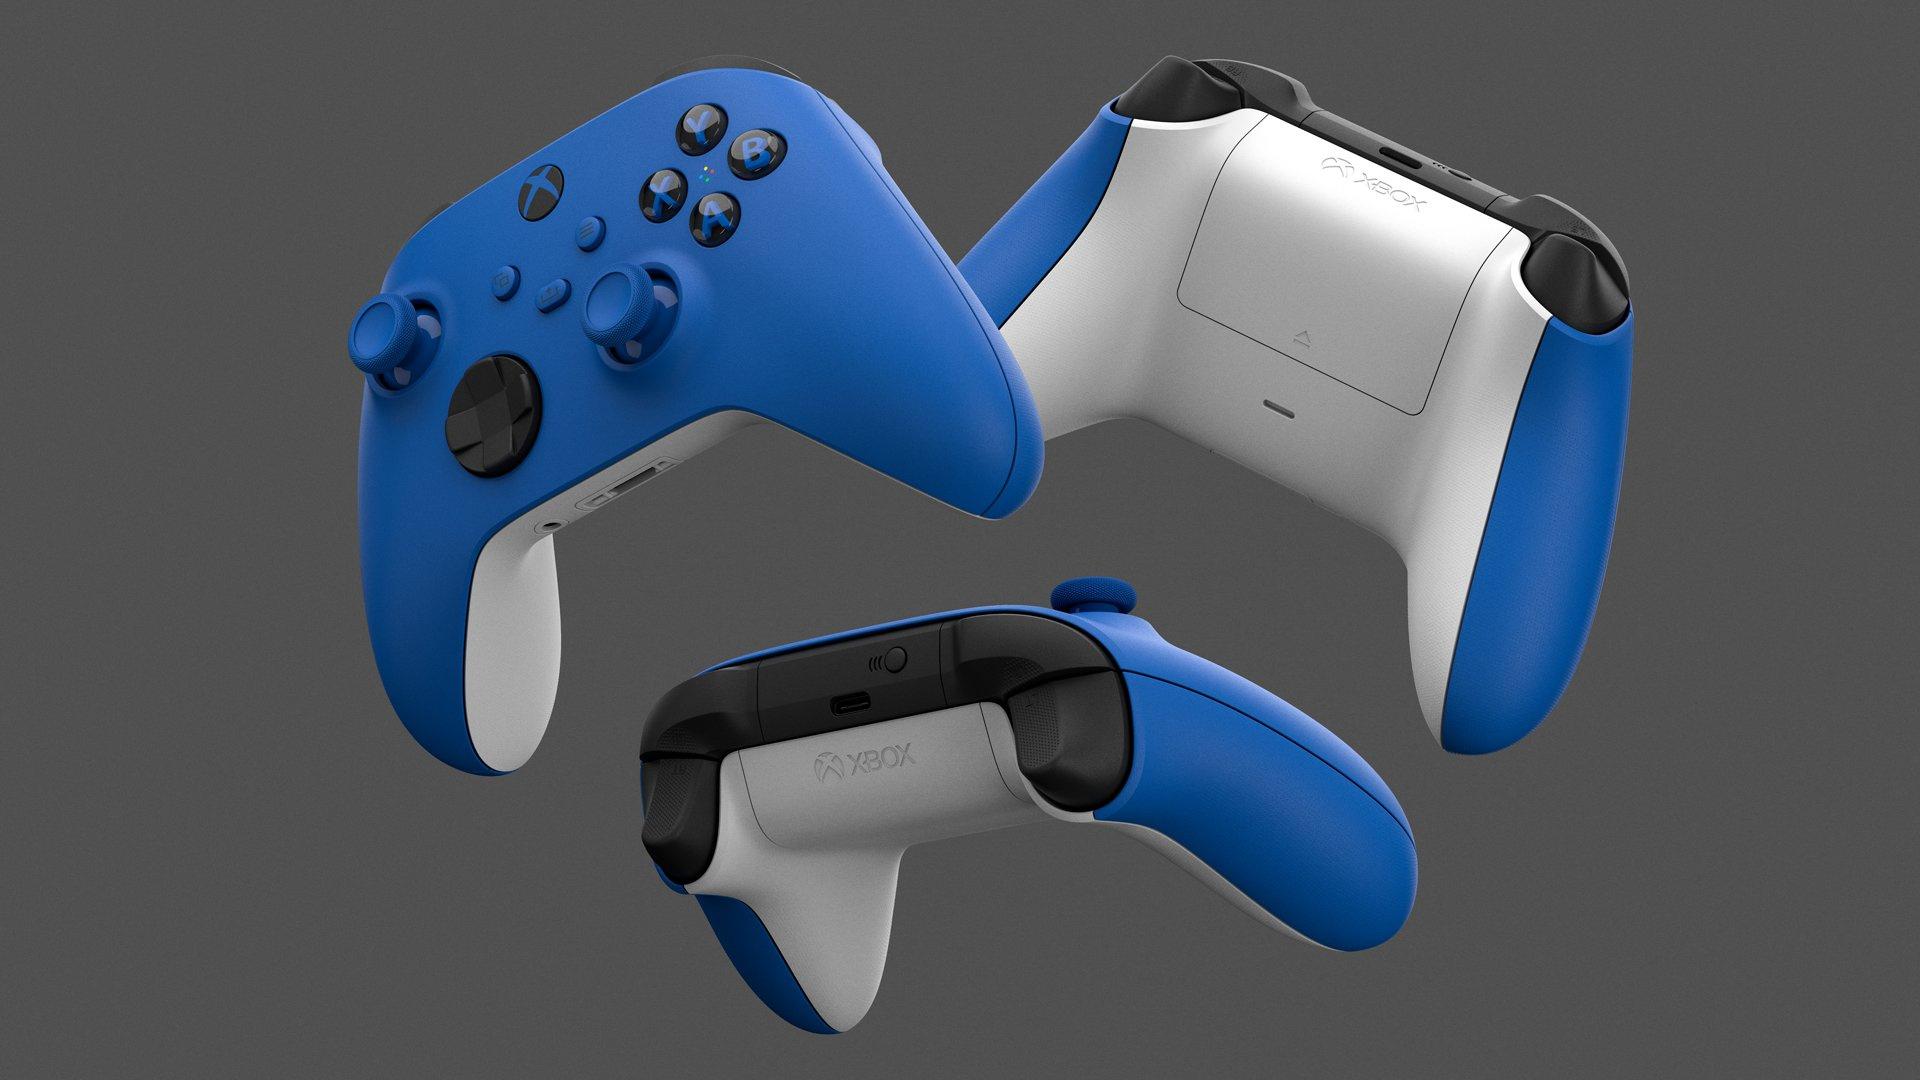 Microsoft показала новый сине-белый контроллер для Xbox One и Series X/S